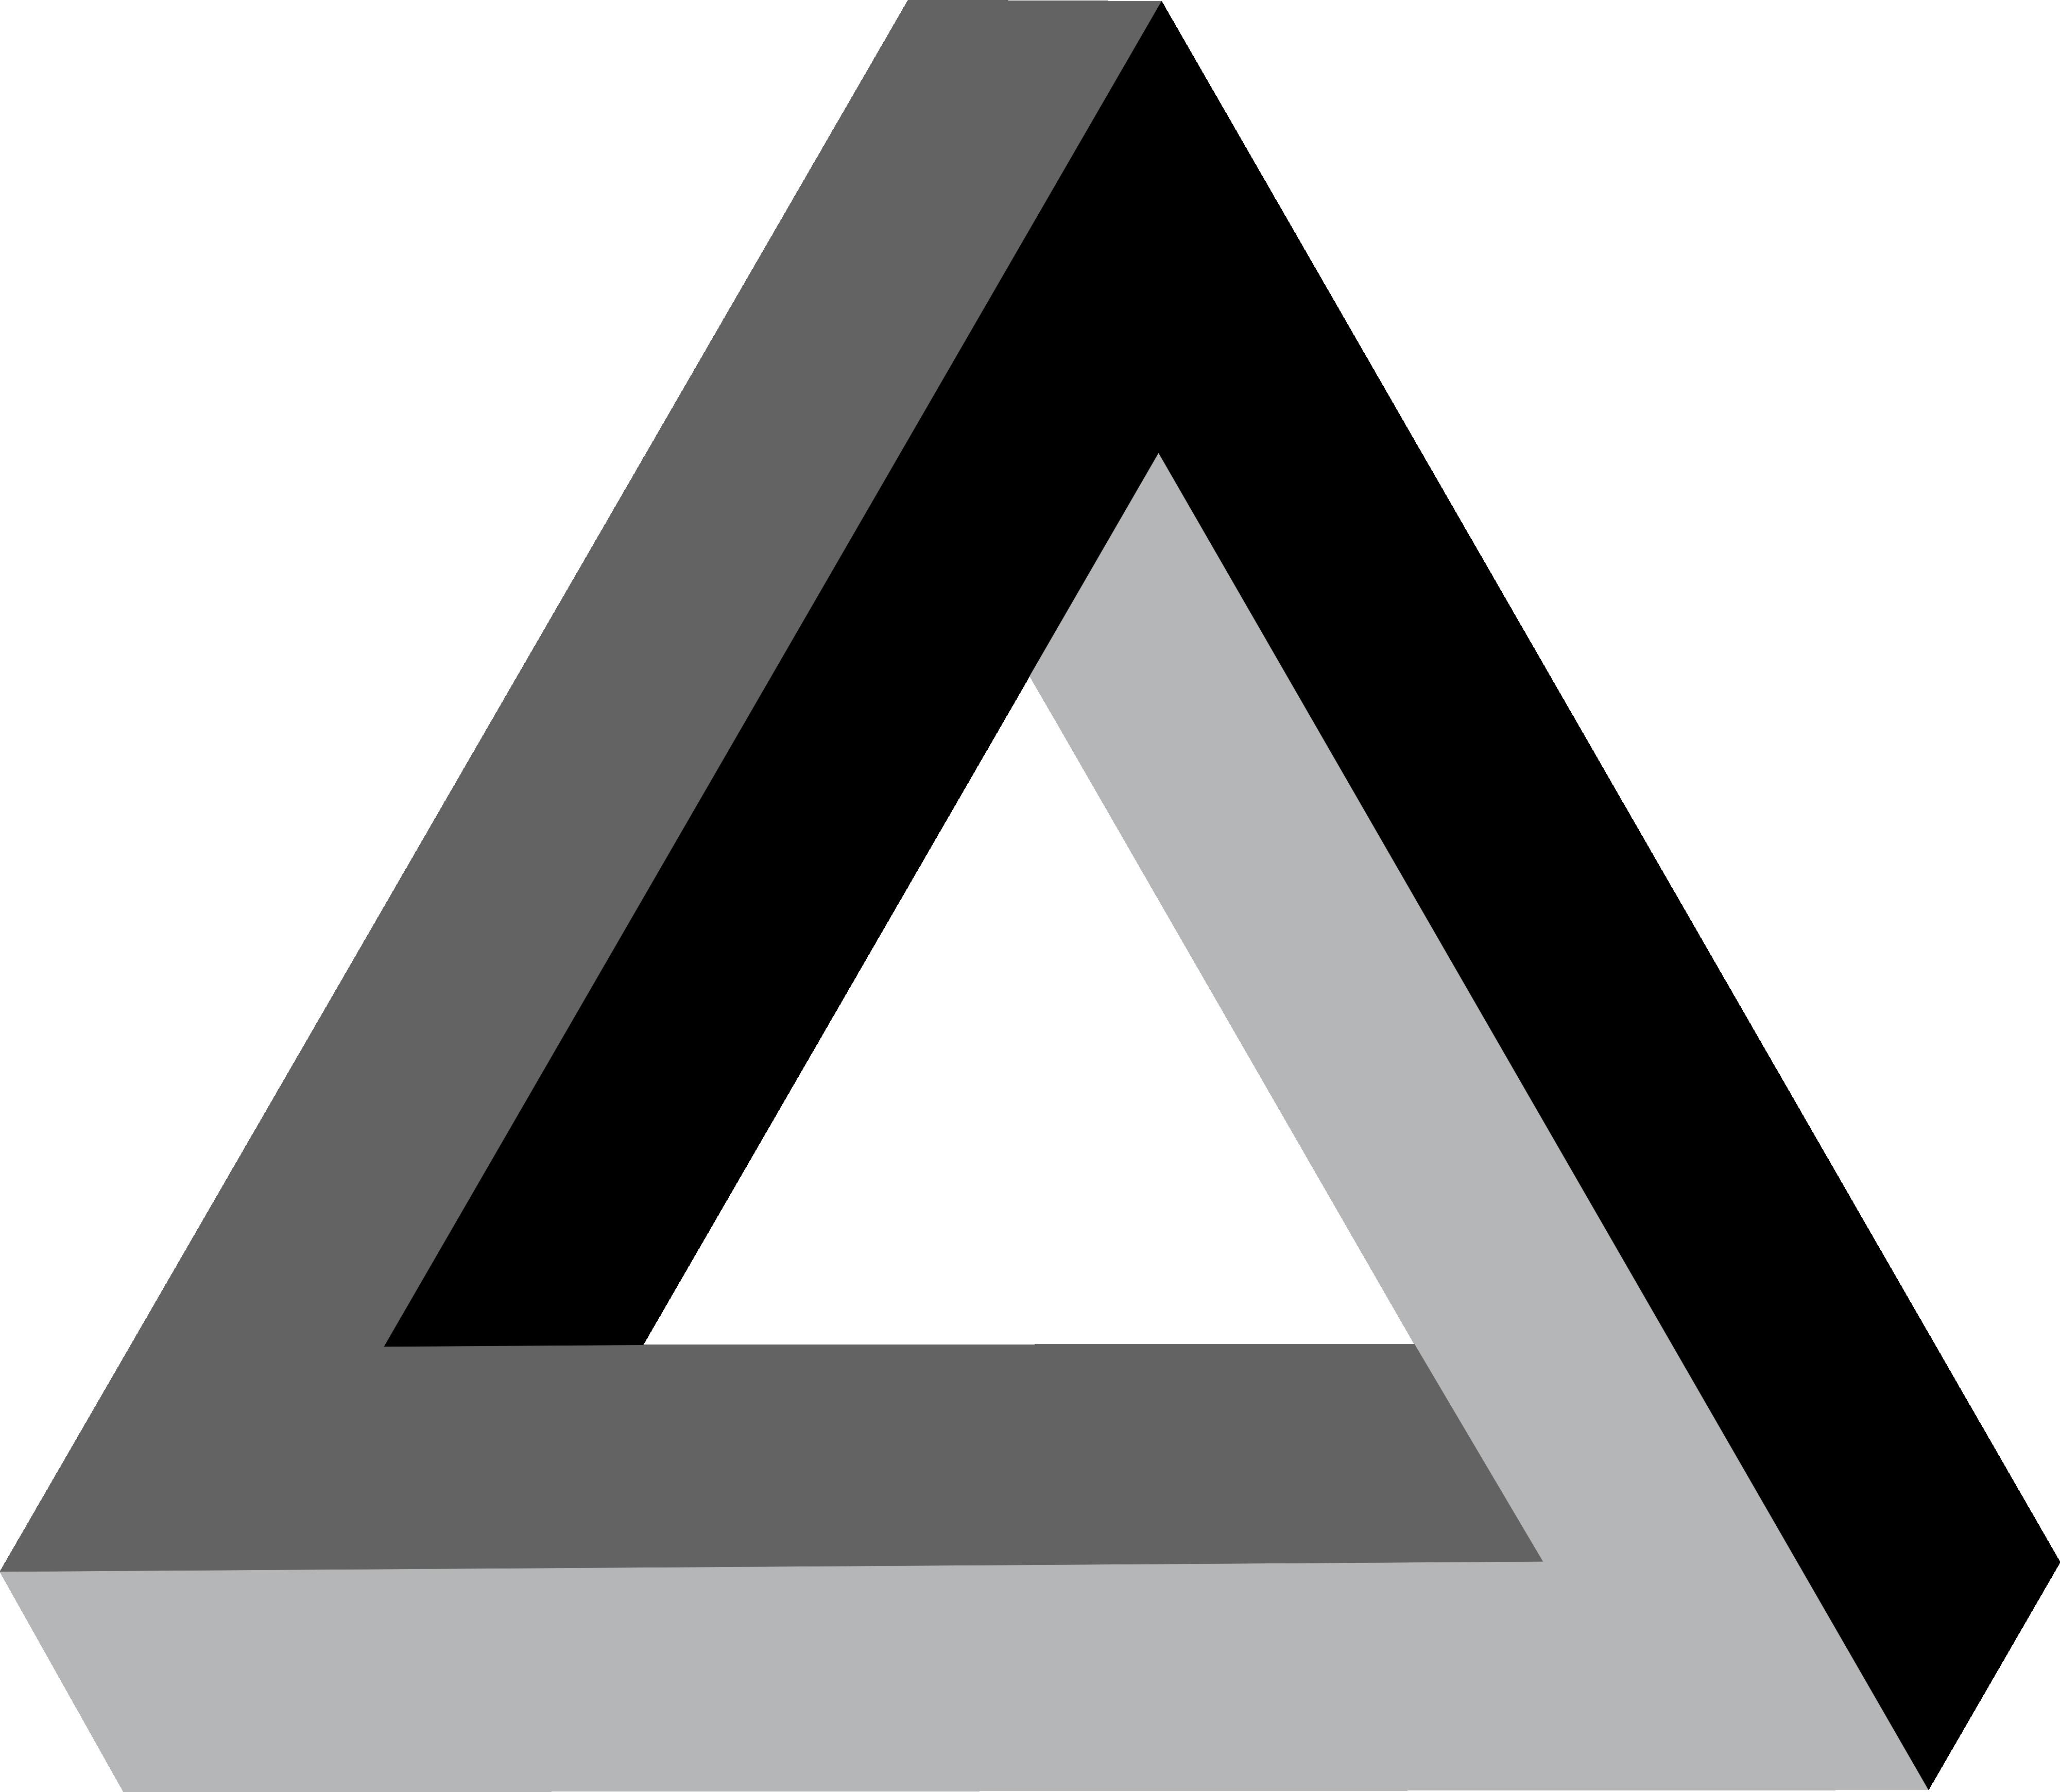 triangular clipart trippy